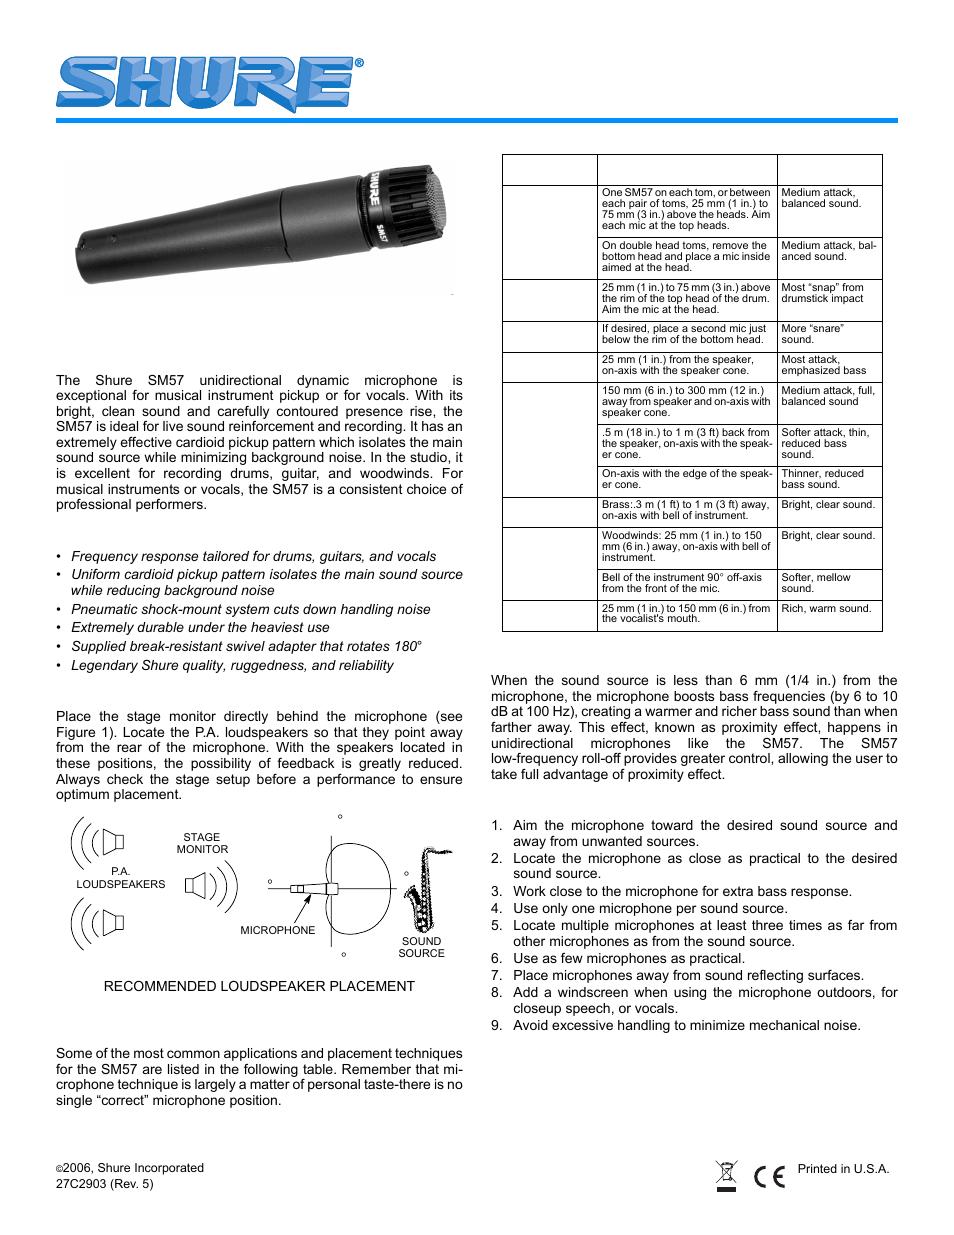 shure sm57 user manual 12 pages rh manualsdir com shure sm57 manual español shure sm57 manual español